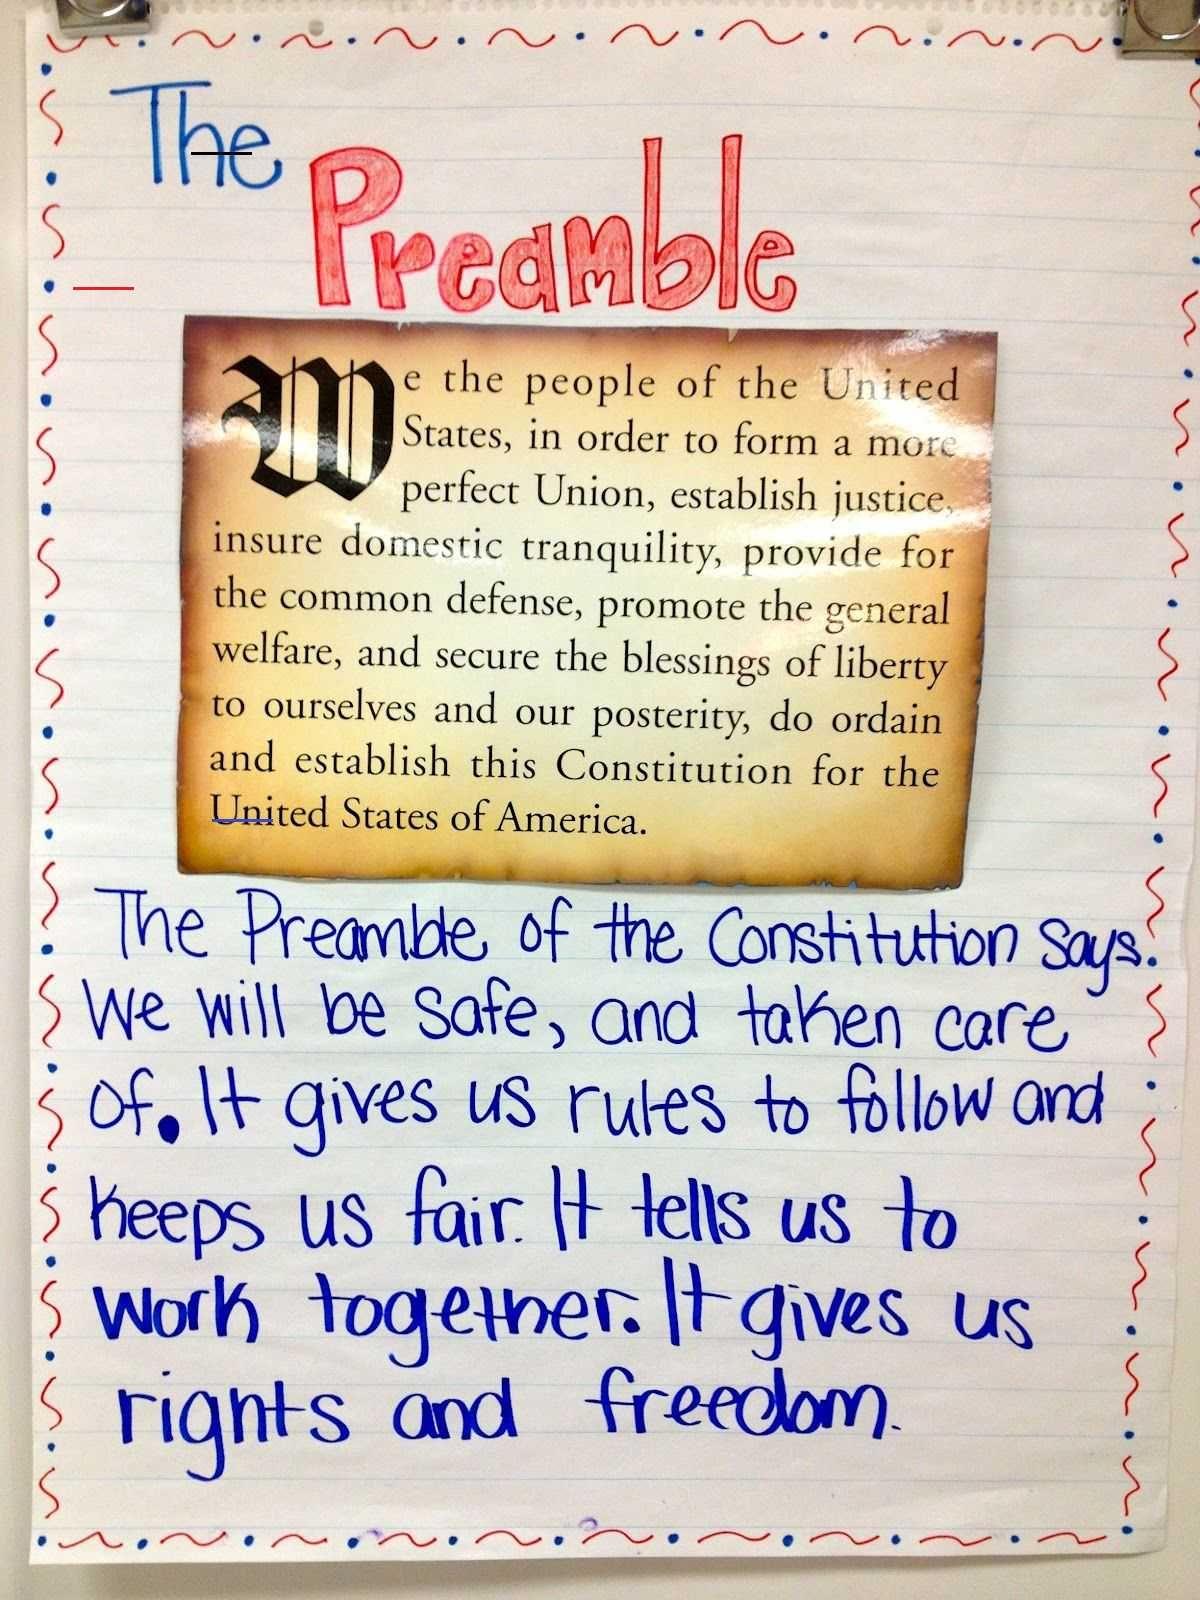 Teachingsocialstudie In 2020 Discus The Preamble Of Constitution